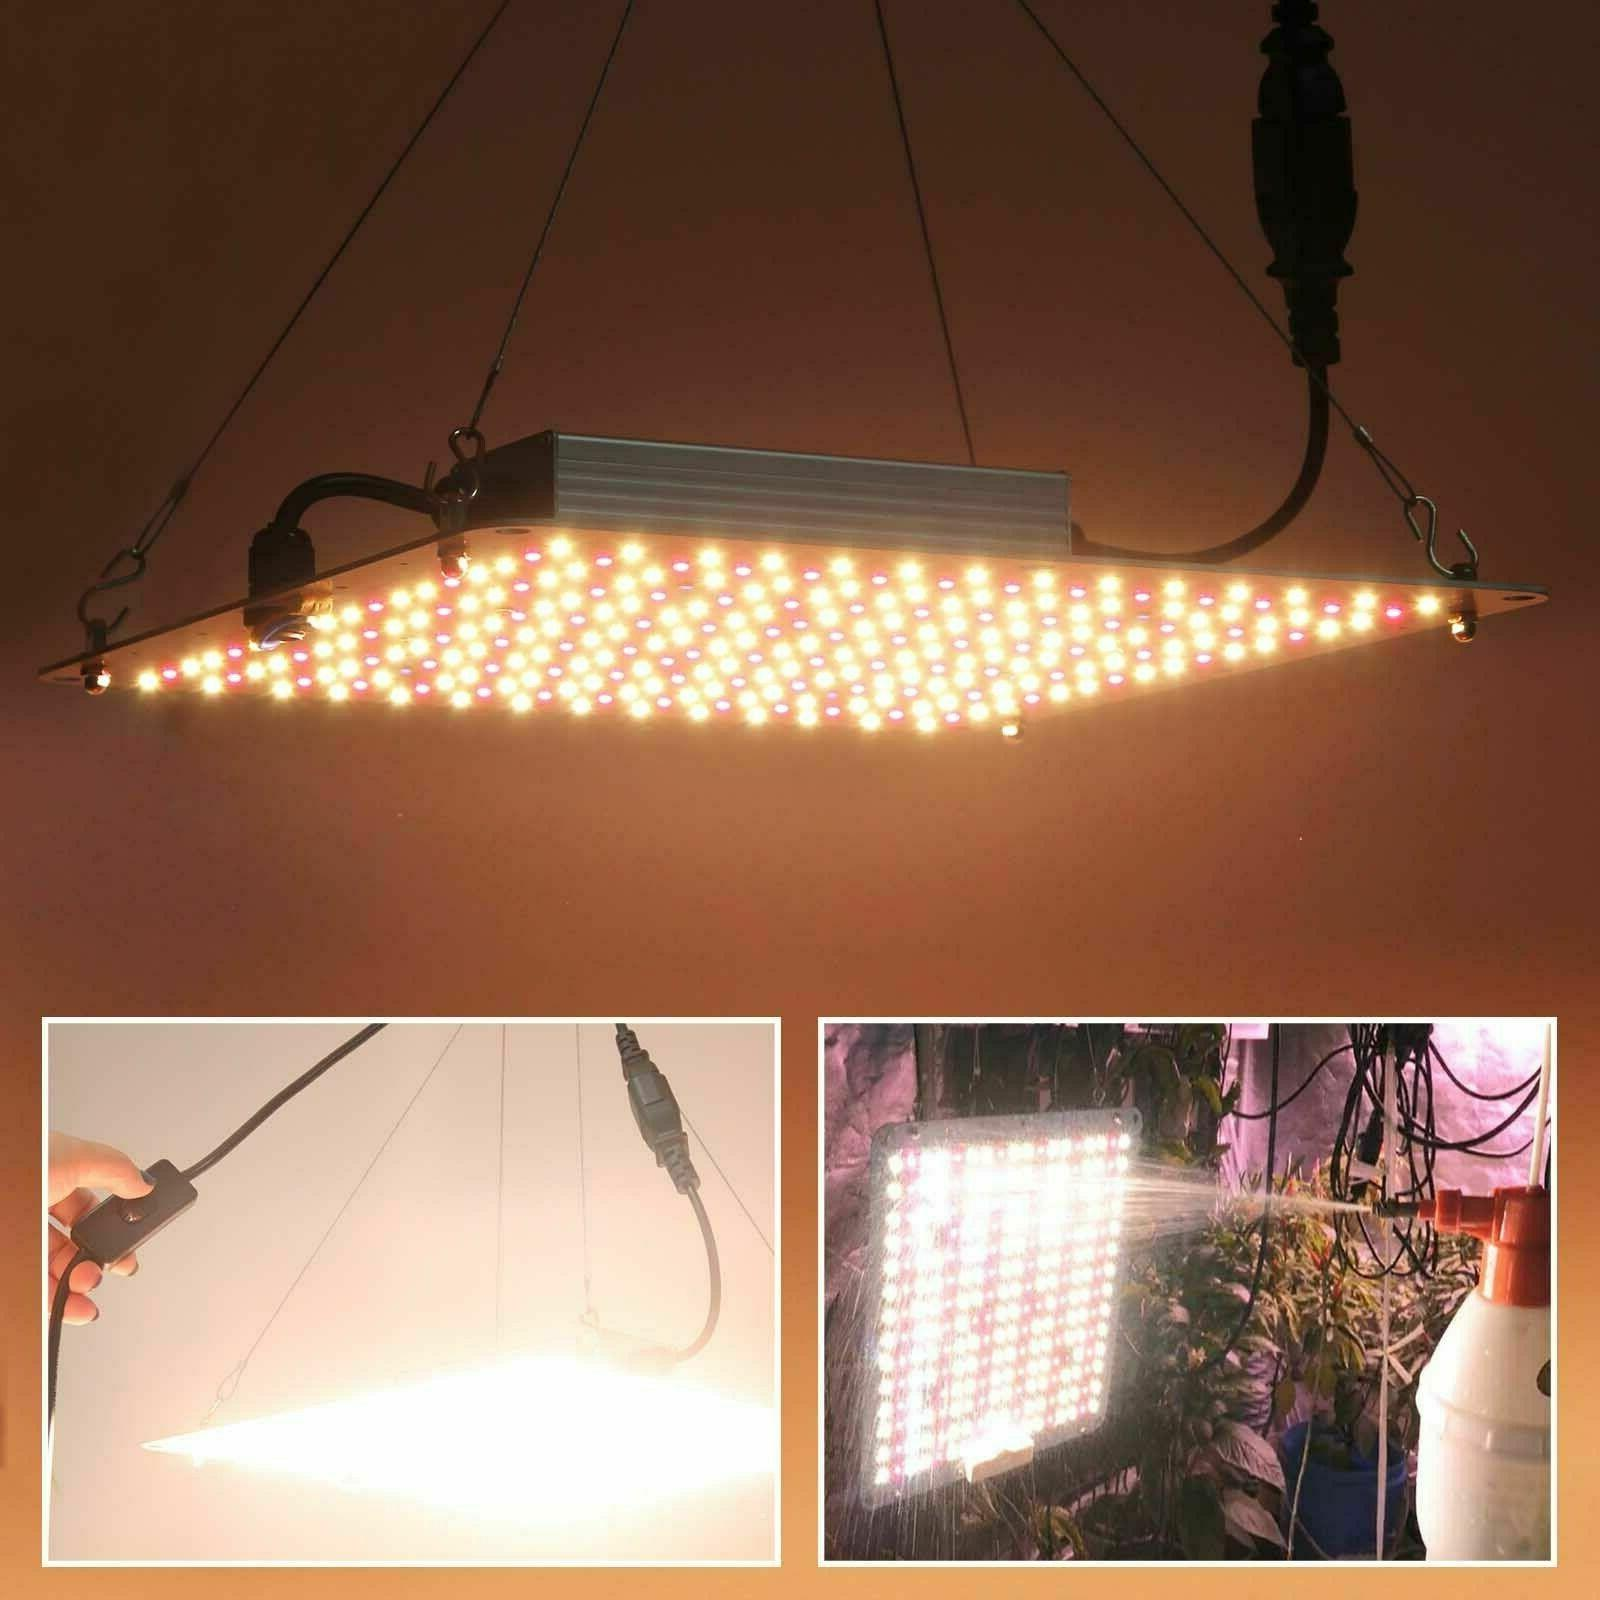 Full 1500W LED Grow Light Indoor Plant IP65